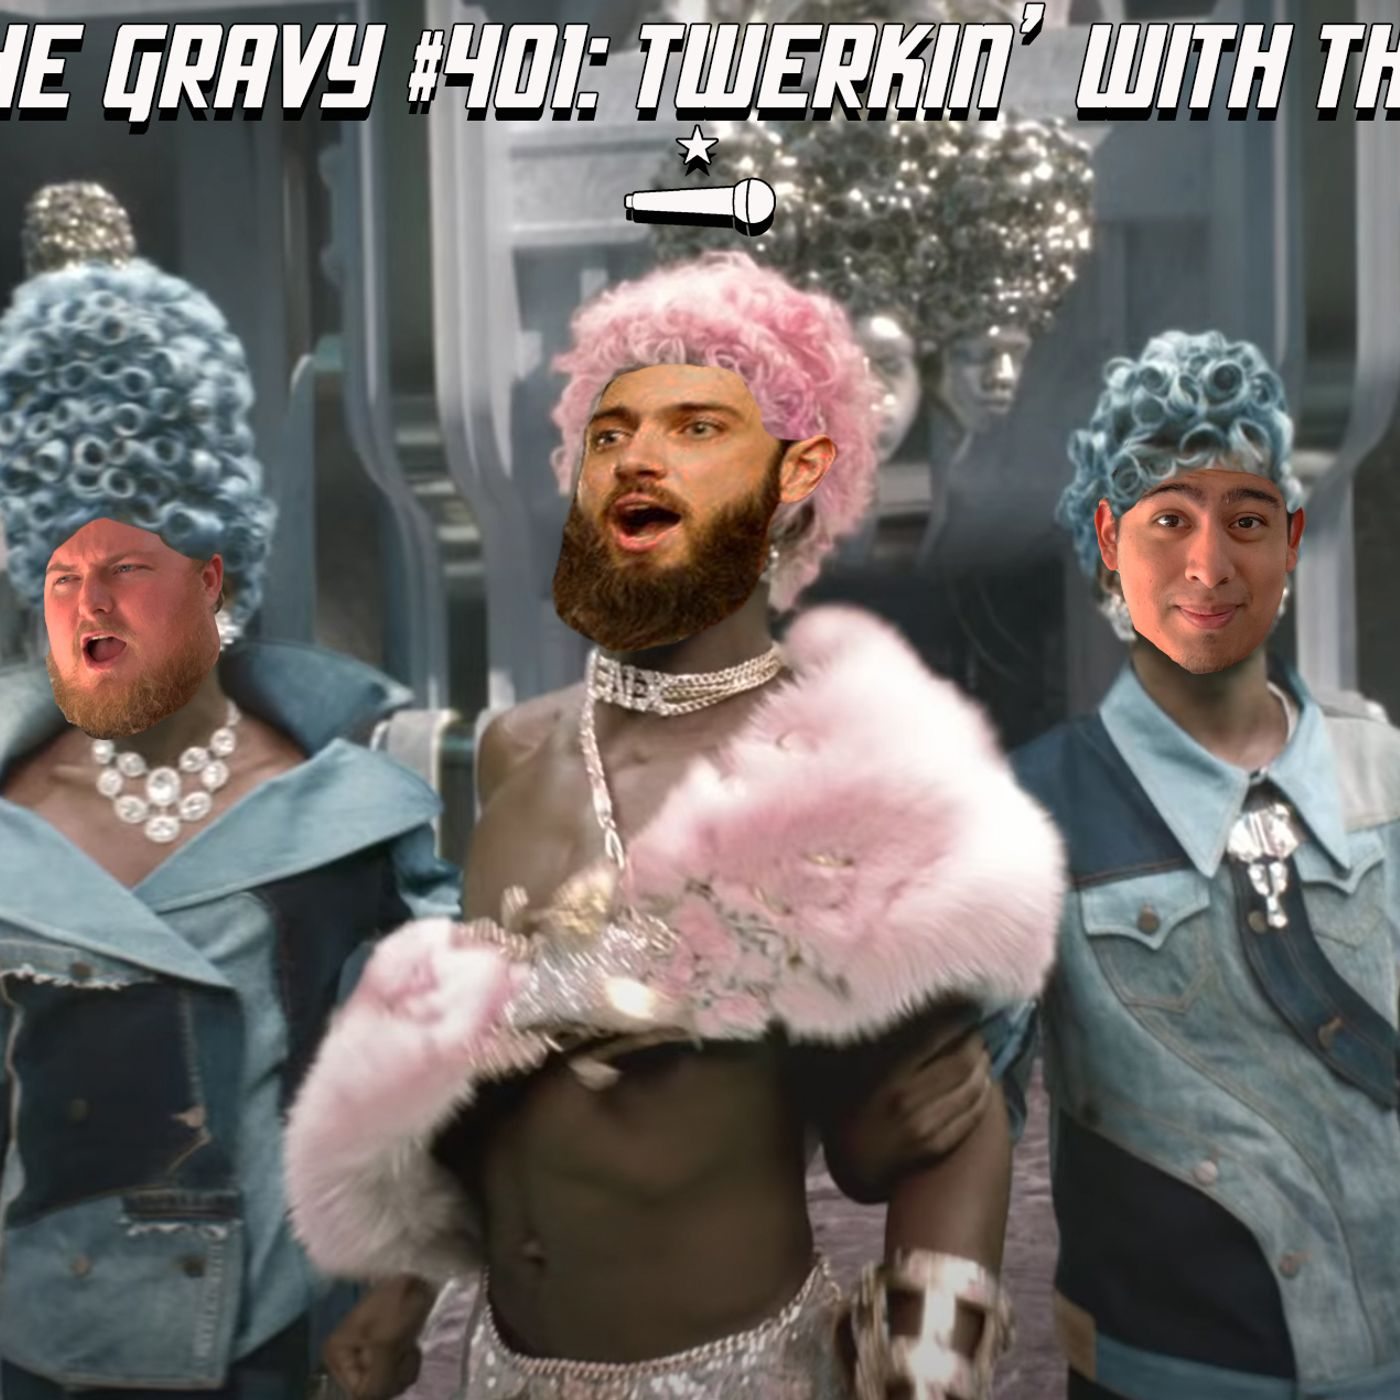 Pass The Gravy #401: Twerkin' With The Devil